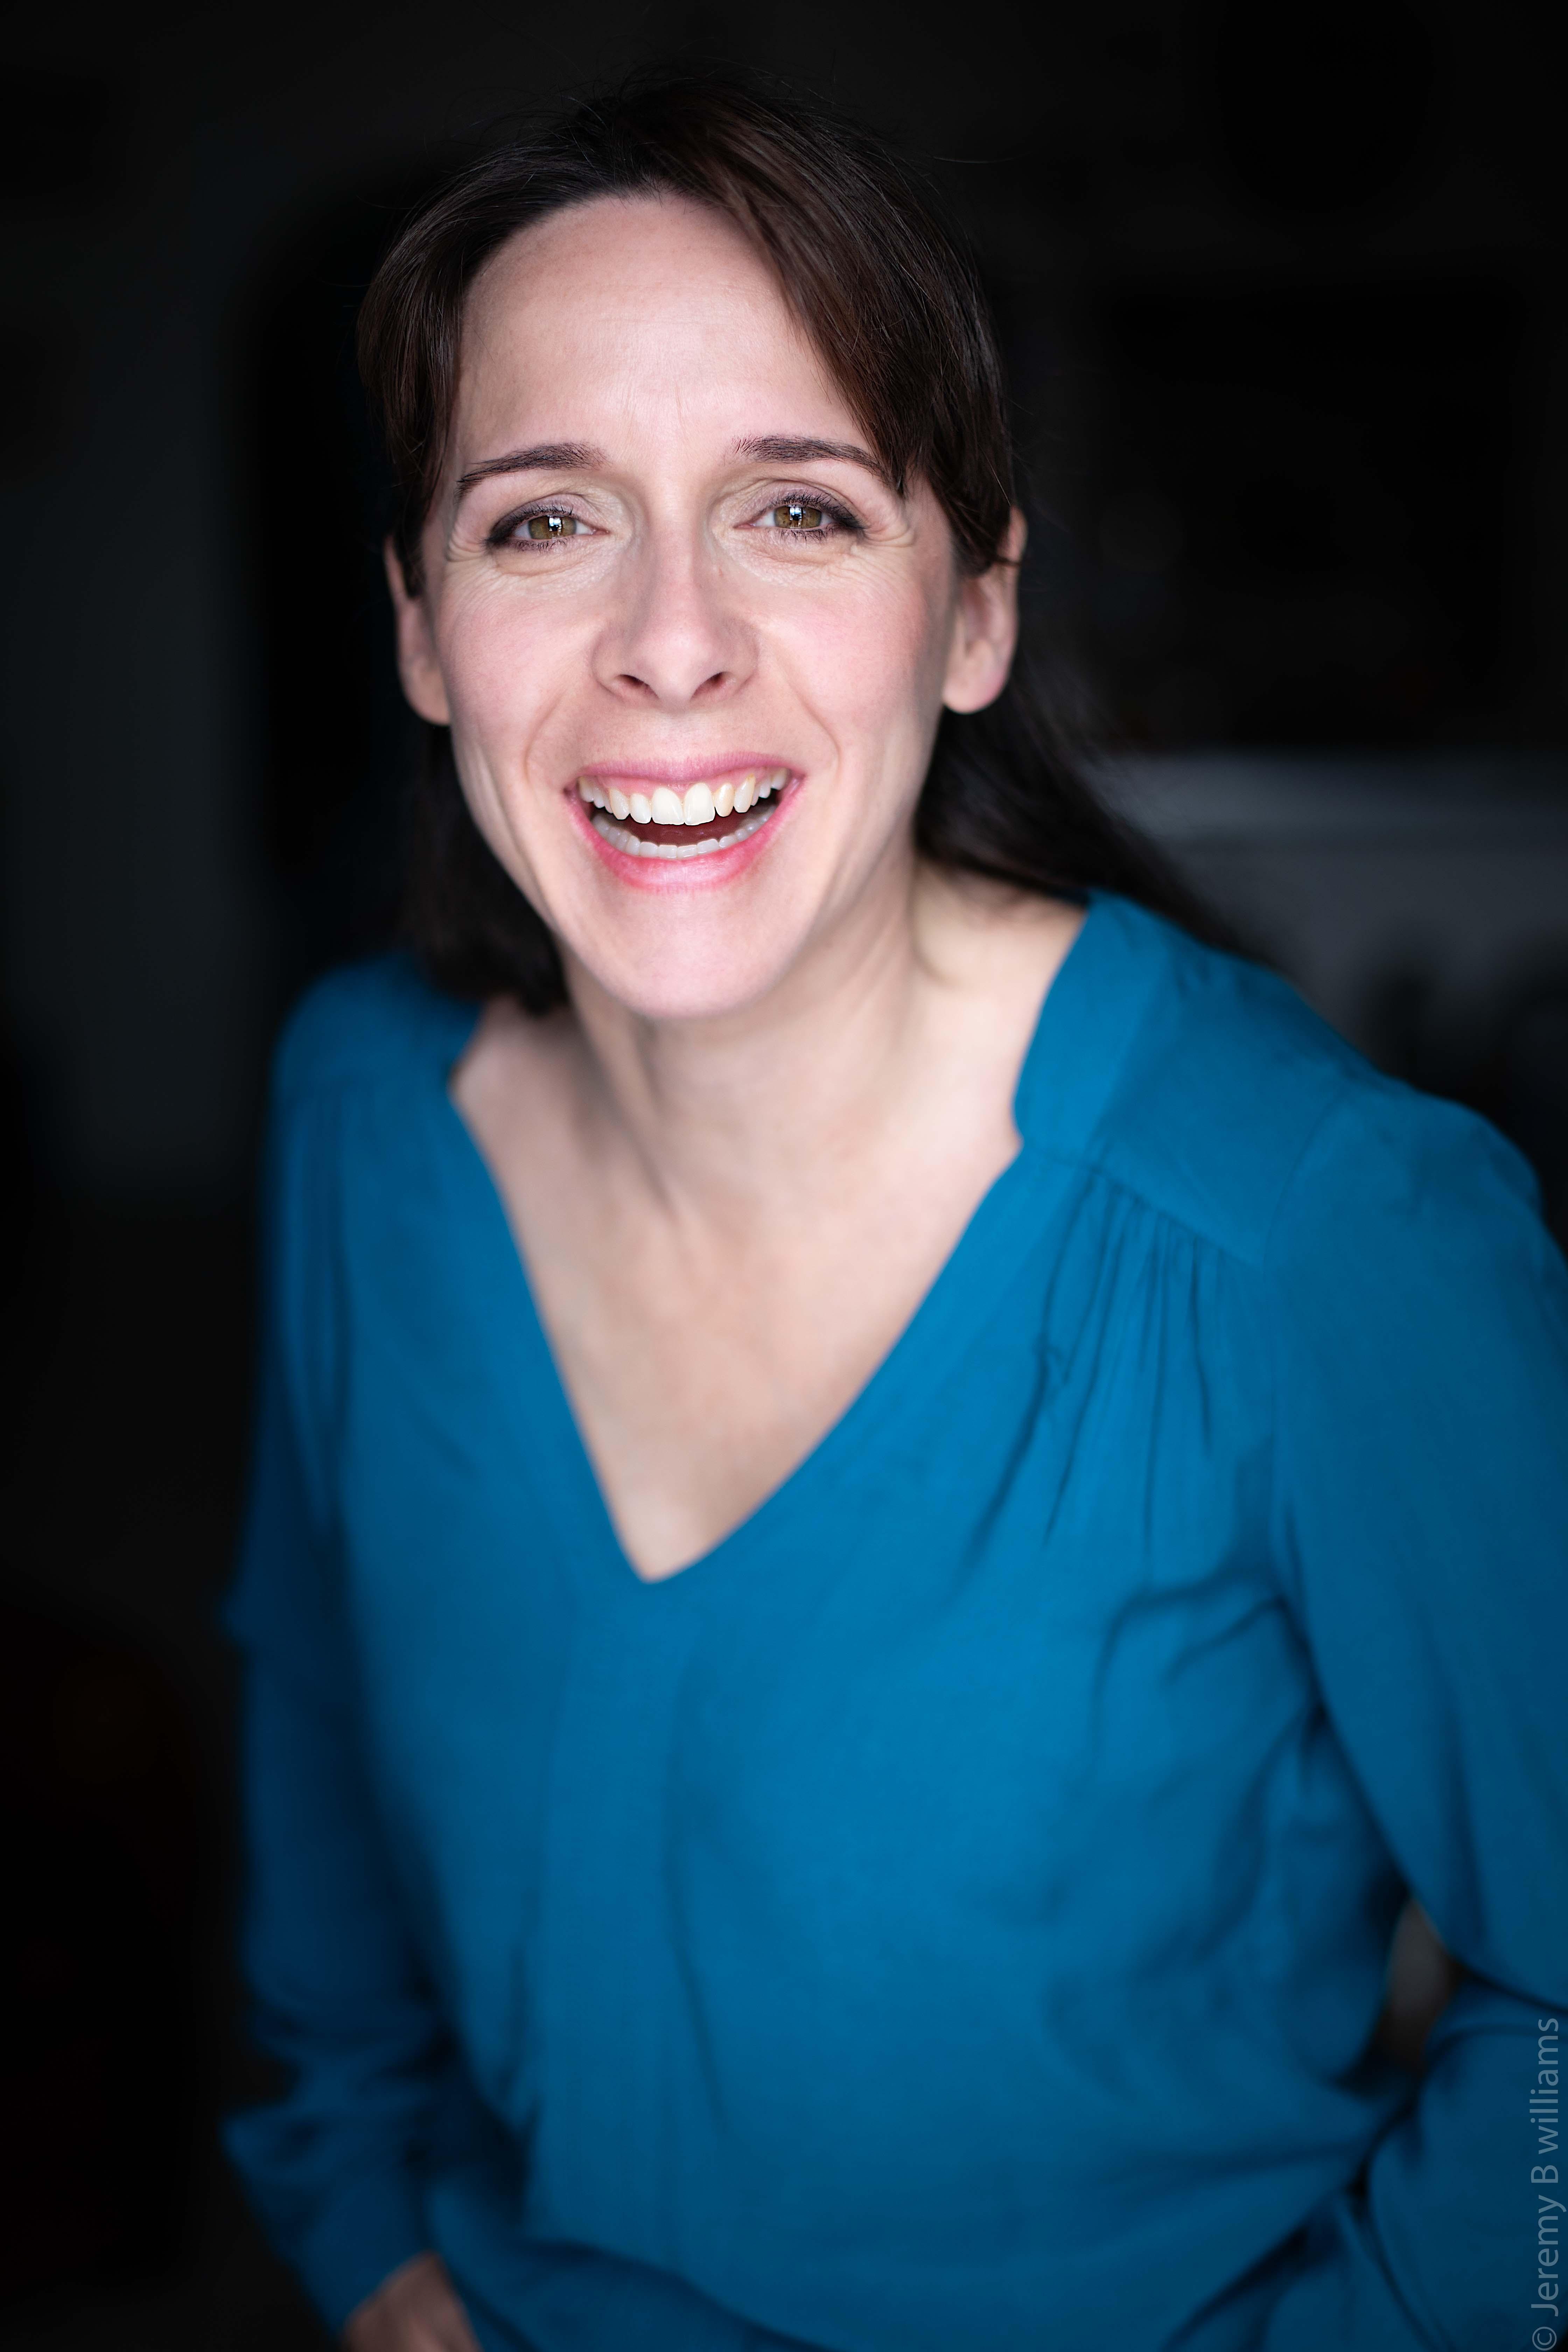 Céline Carascos